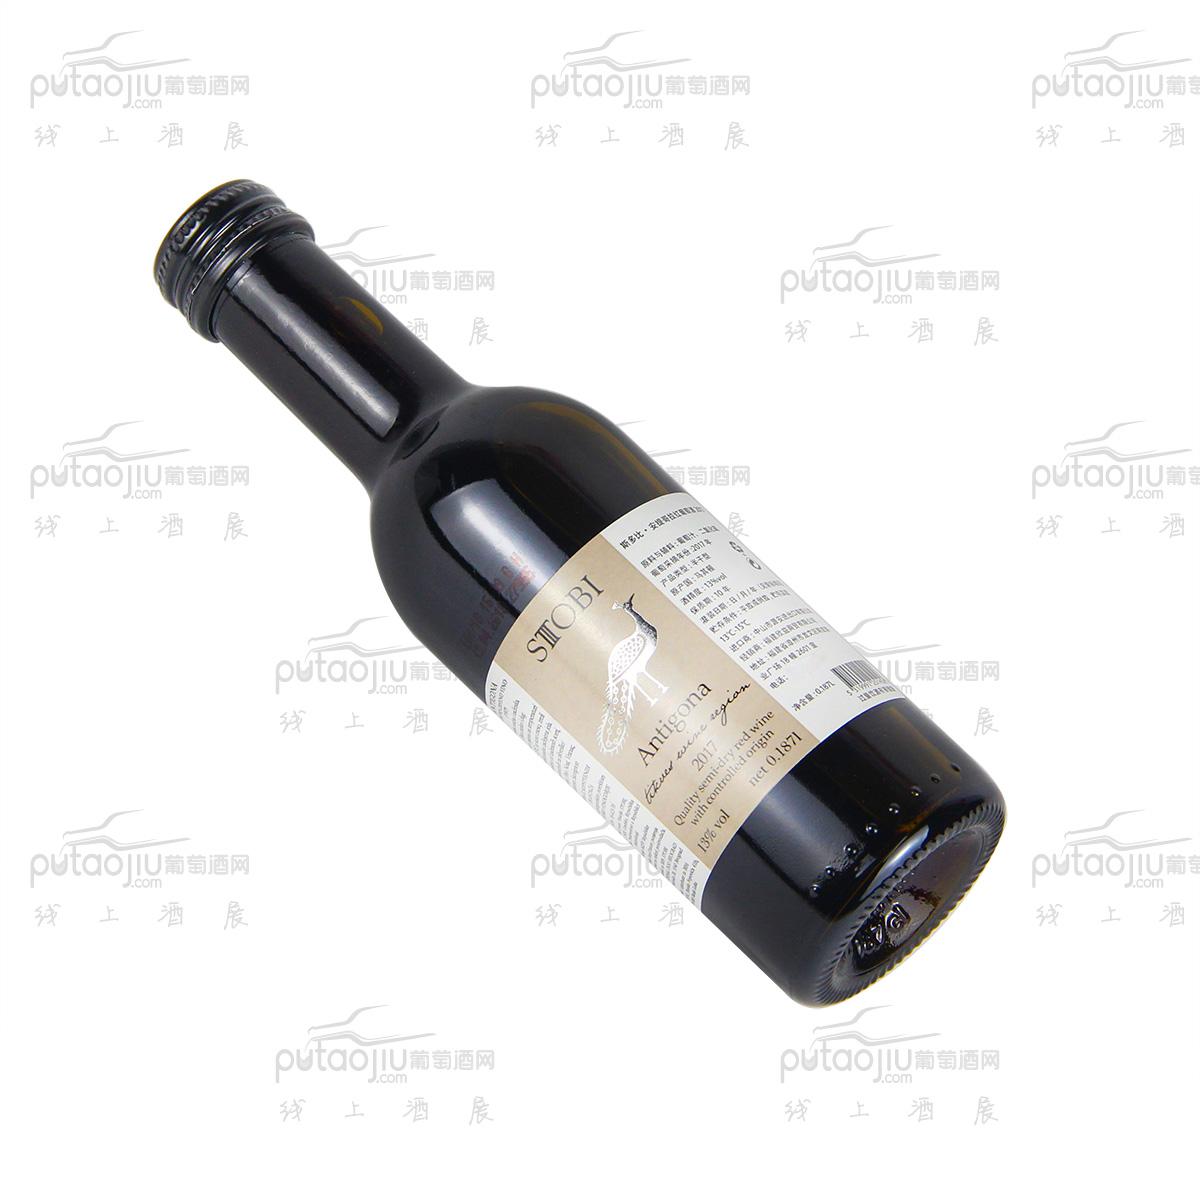 STOBI斯多比酒庄(Antigona)安提哥拉187ml A级混酿半干红葡萄酒小众国家原装进口北马其顿红酒